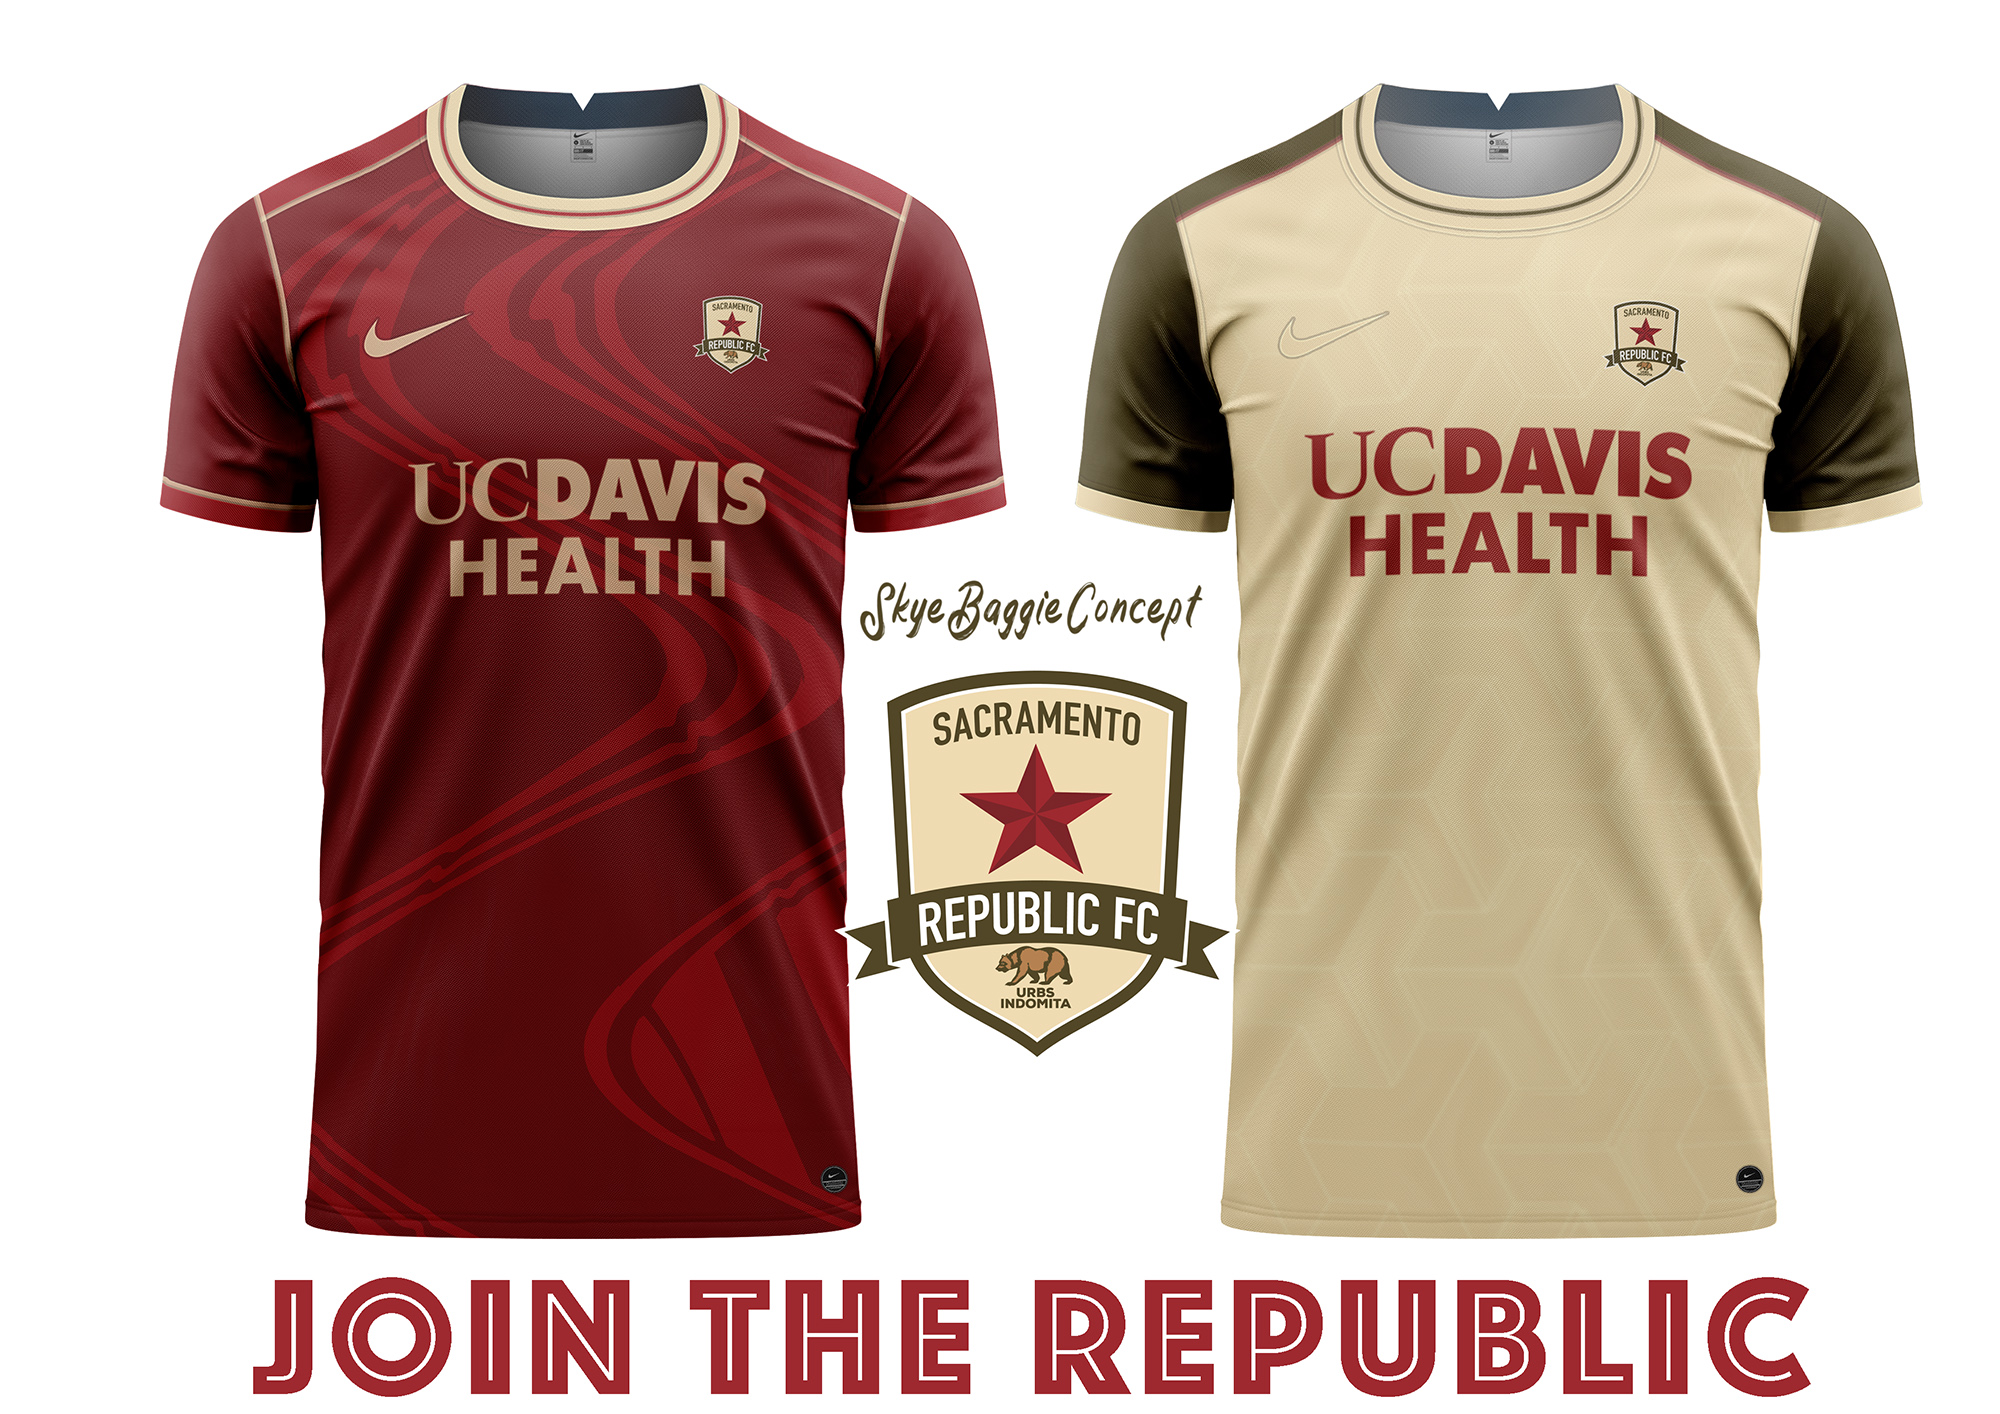 https://www.designfootball.com/images/joomgallery/originals/football_kits_120/sacramento_republic_concept_kits_20200705_1519479726.jpg